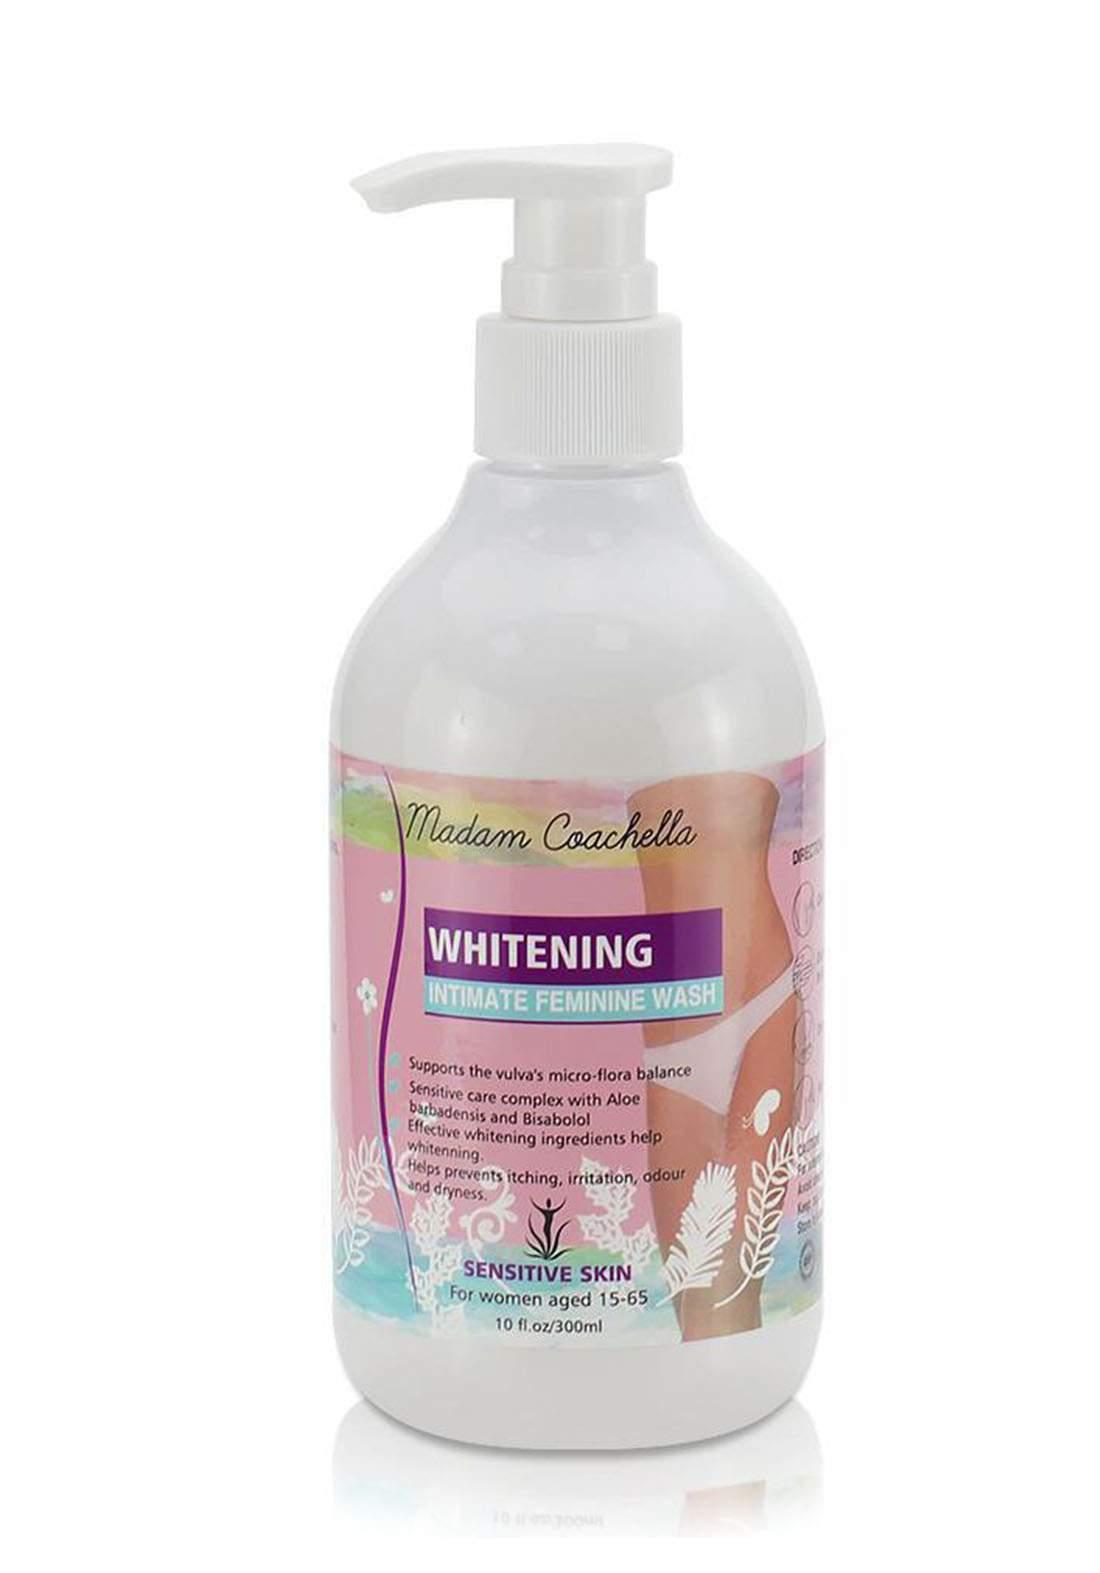 Madam Coachella whitening intimate feminine wash 300 ml غسول نسائي